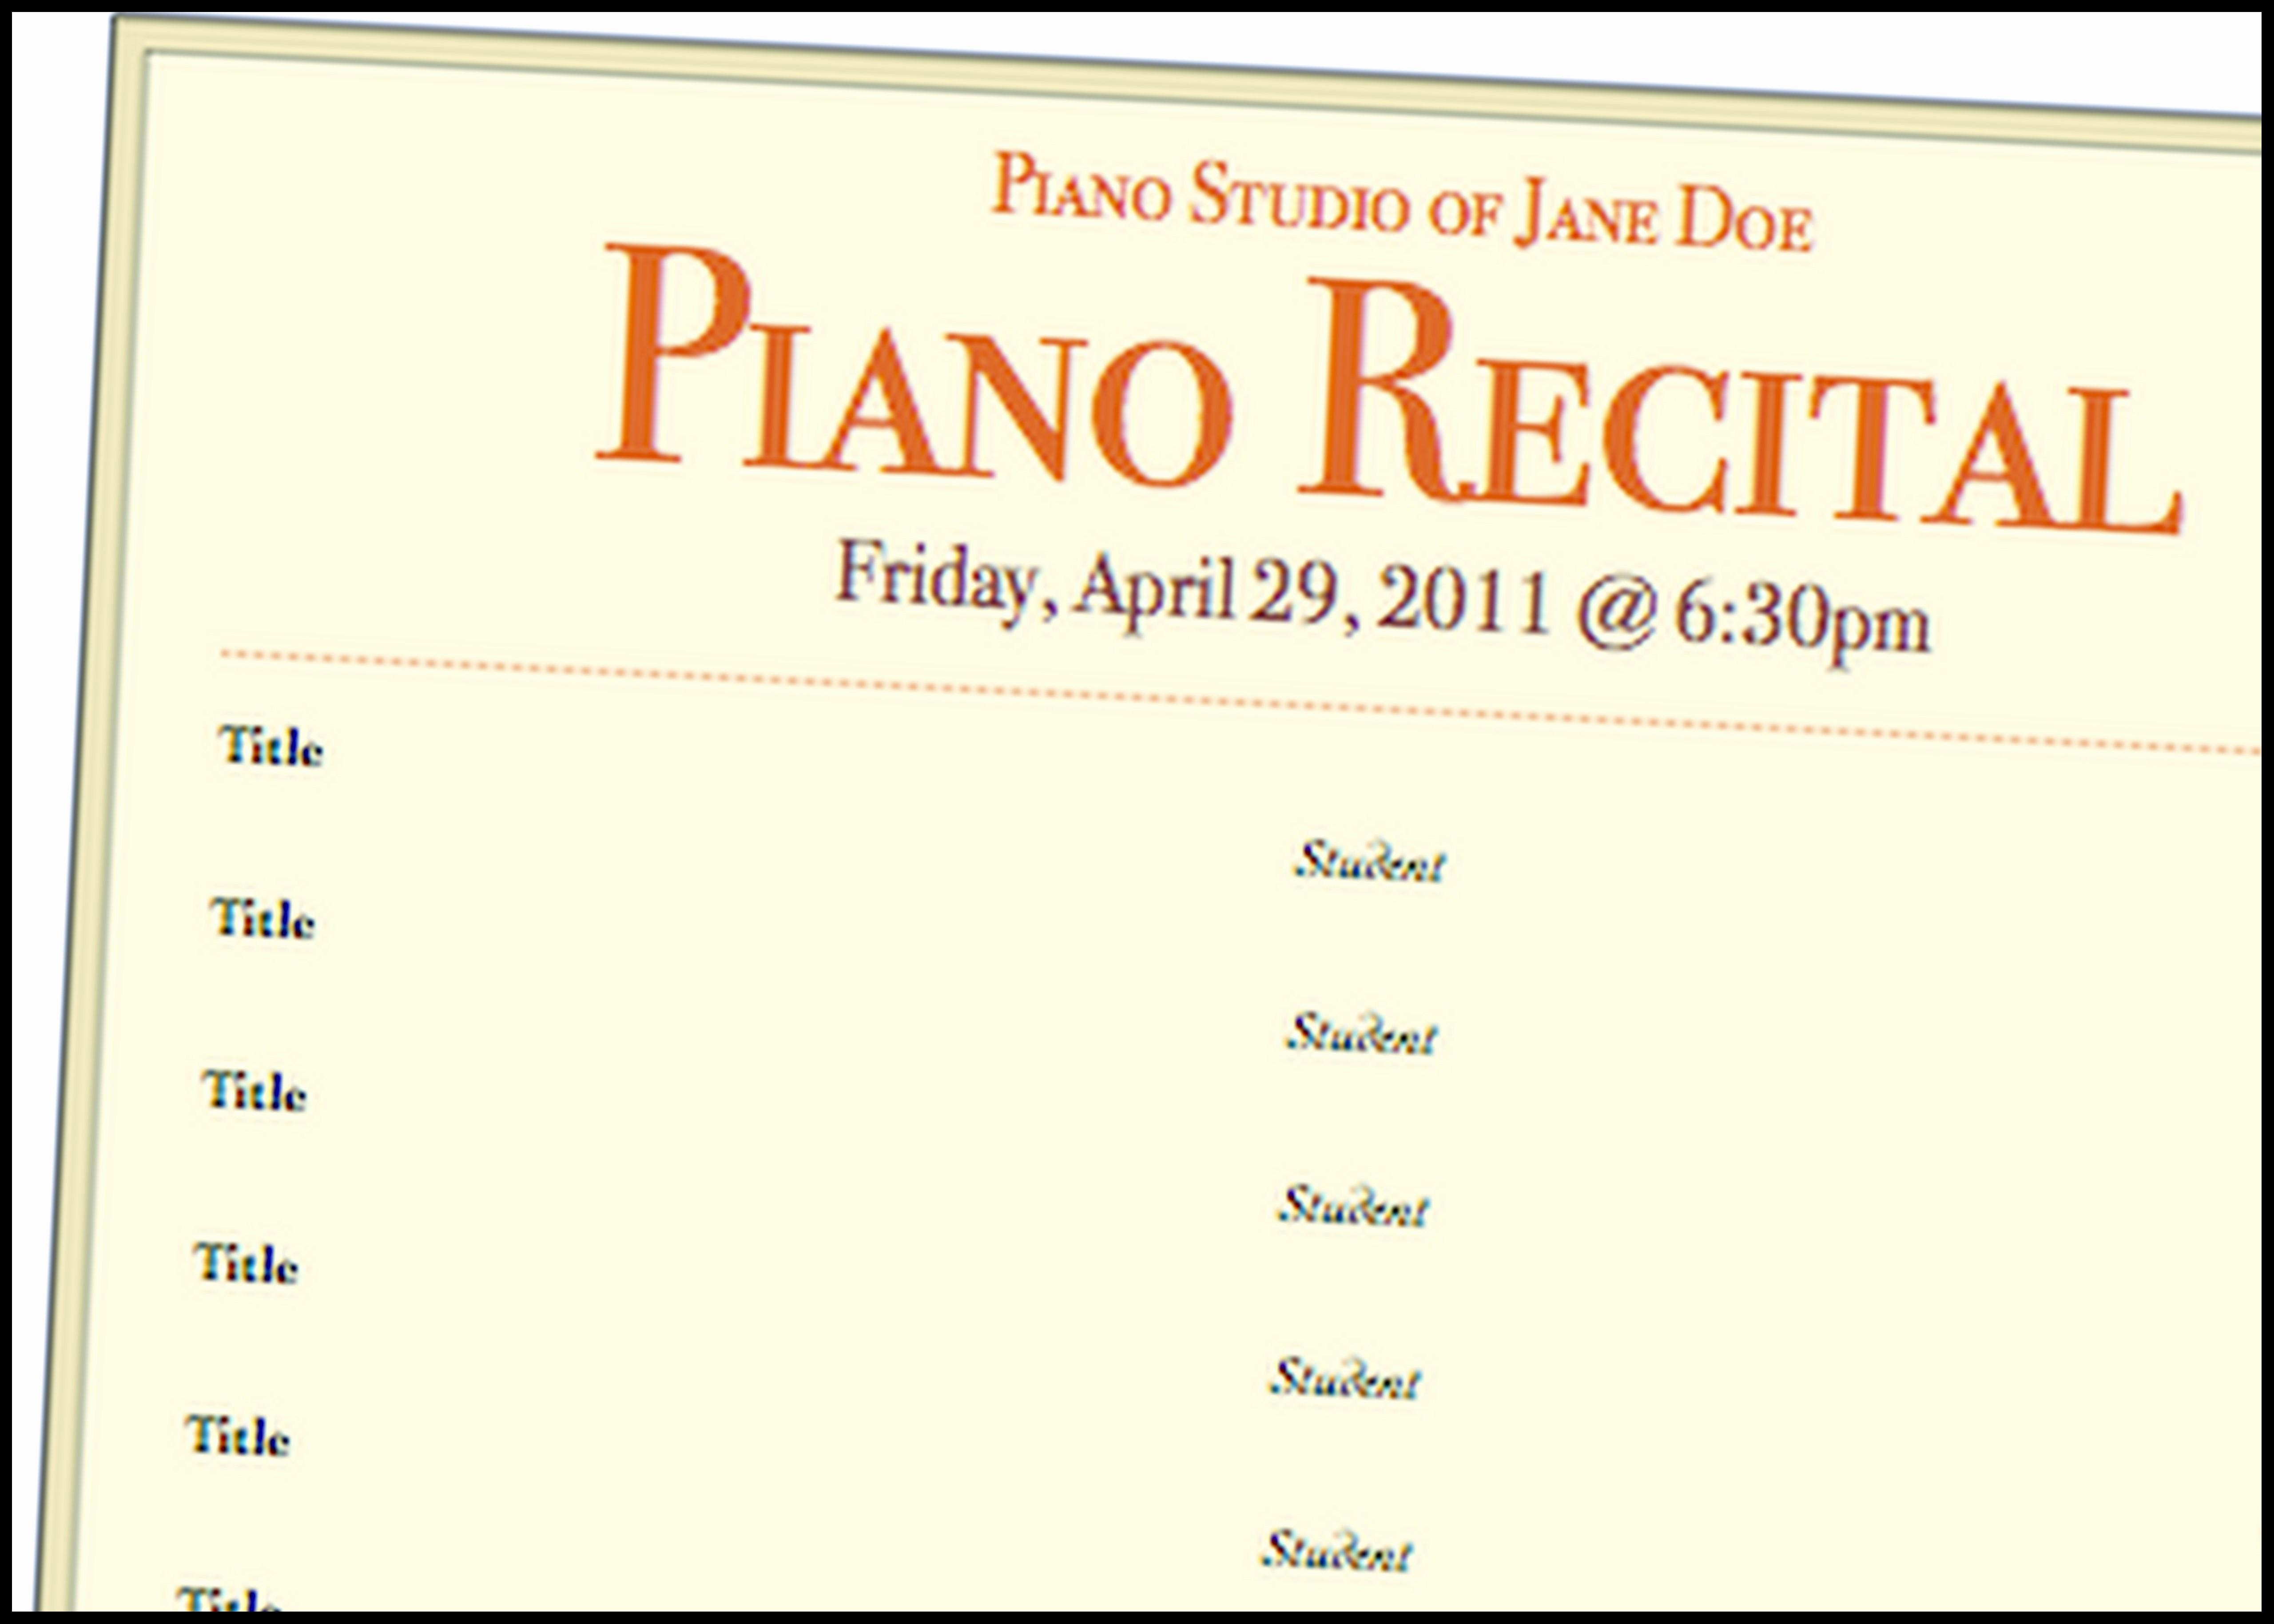 Piano Recital Program Template Free Elegant Just Added Recital Program Template 3